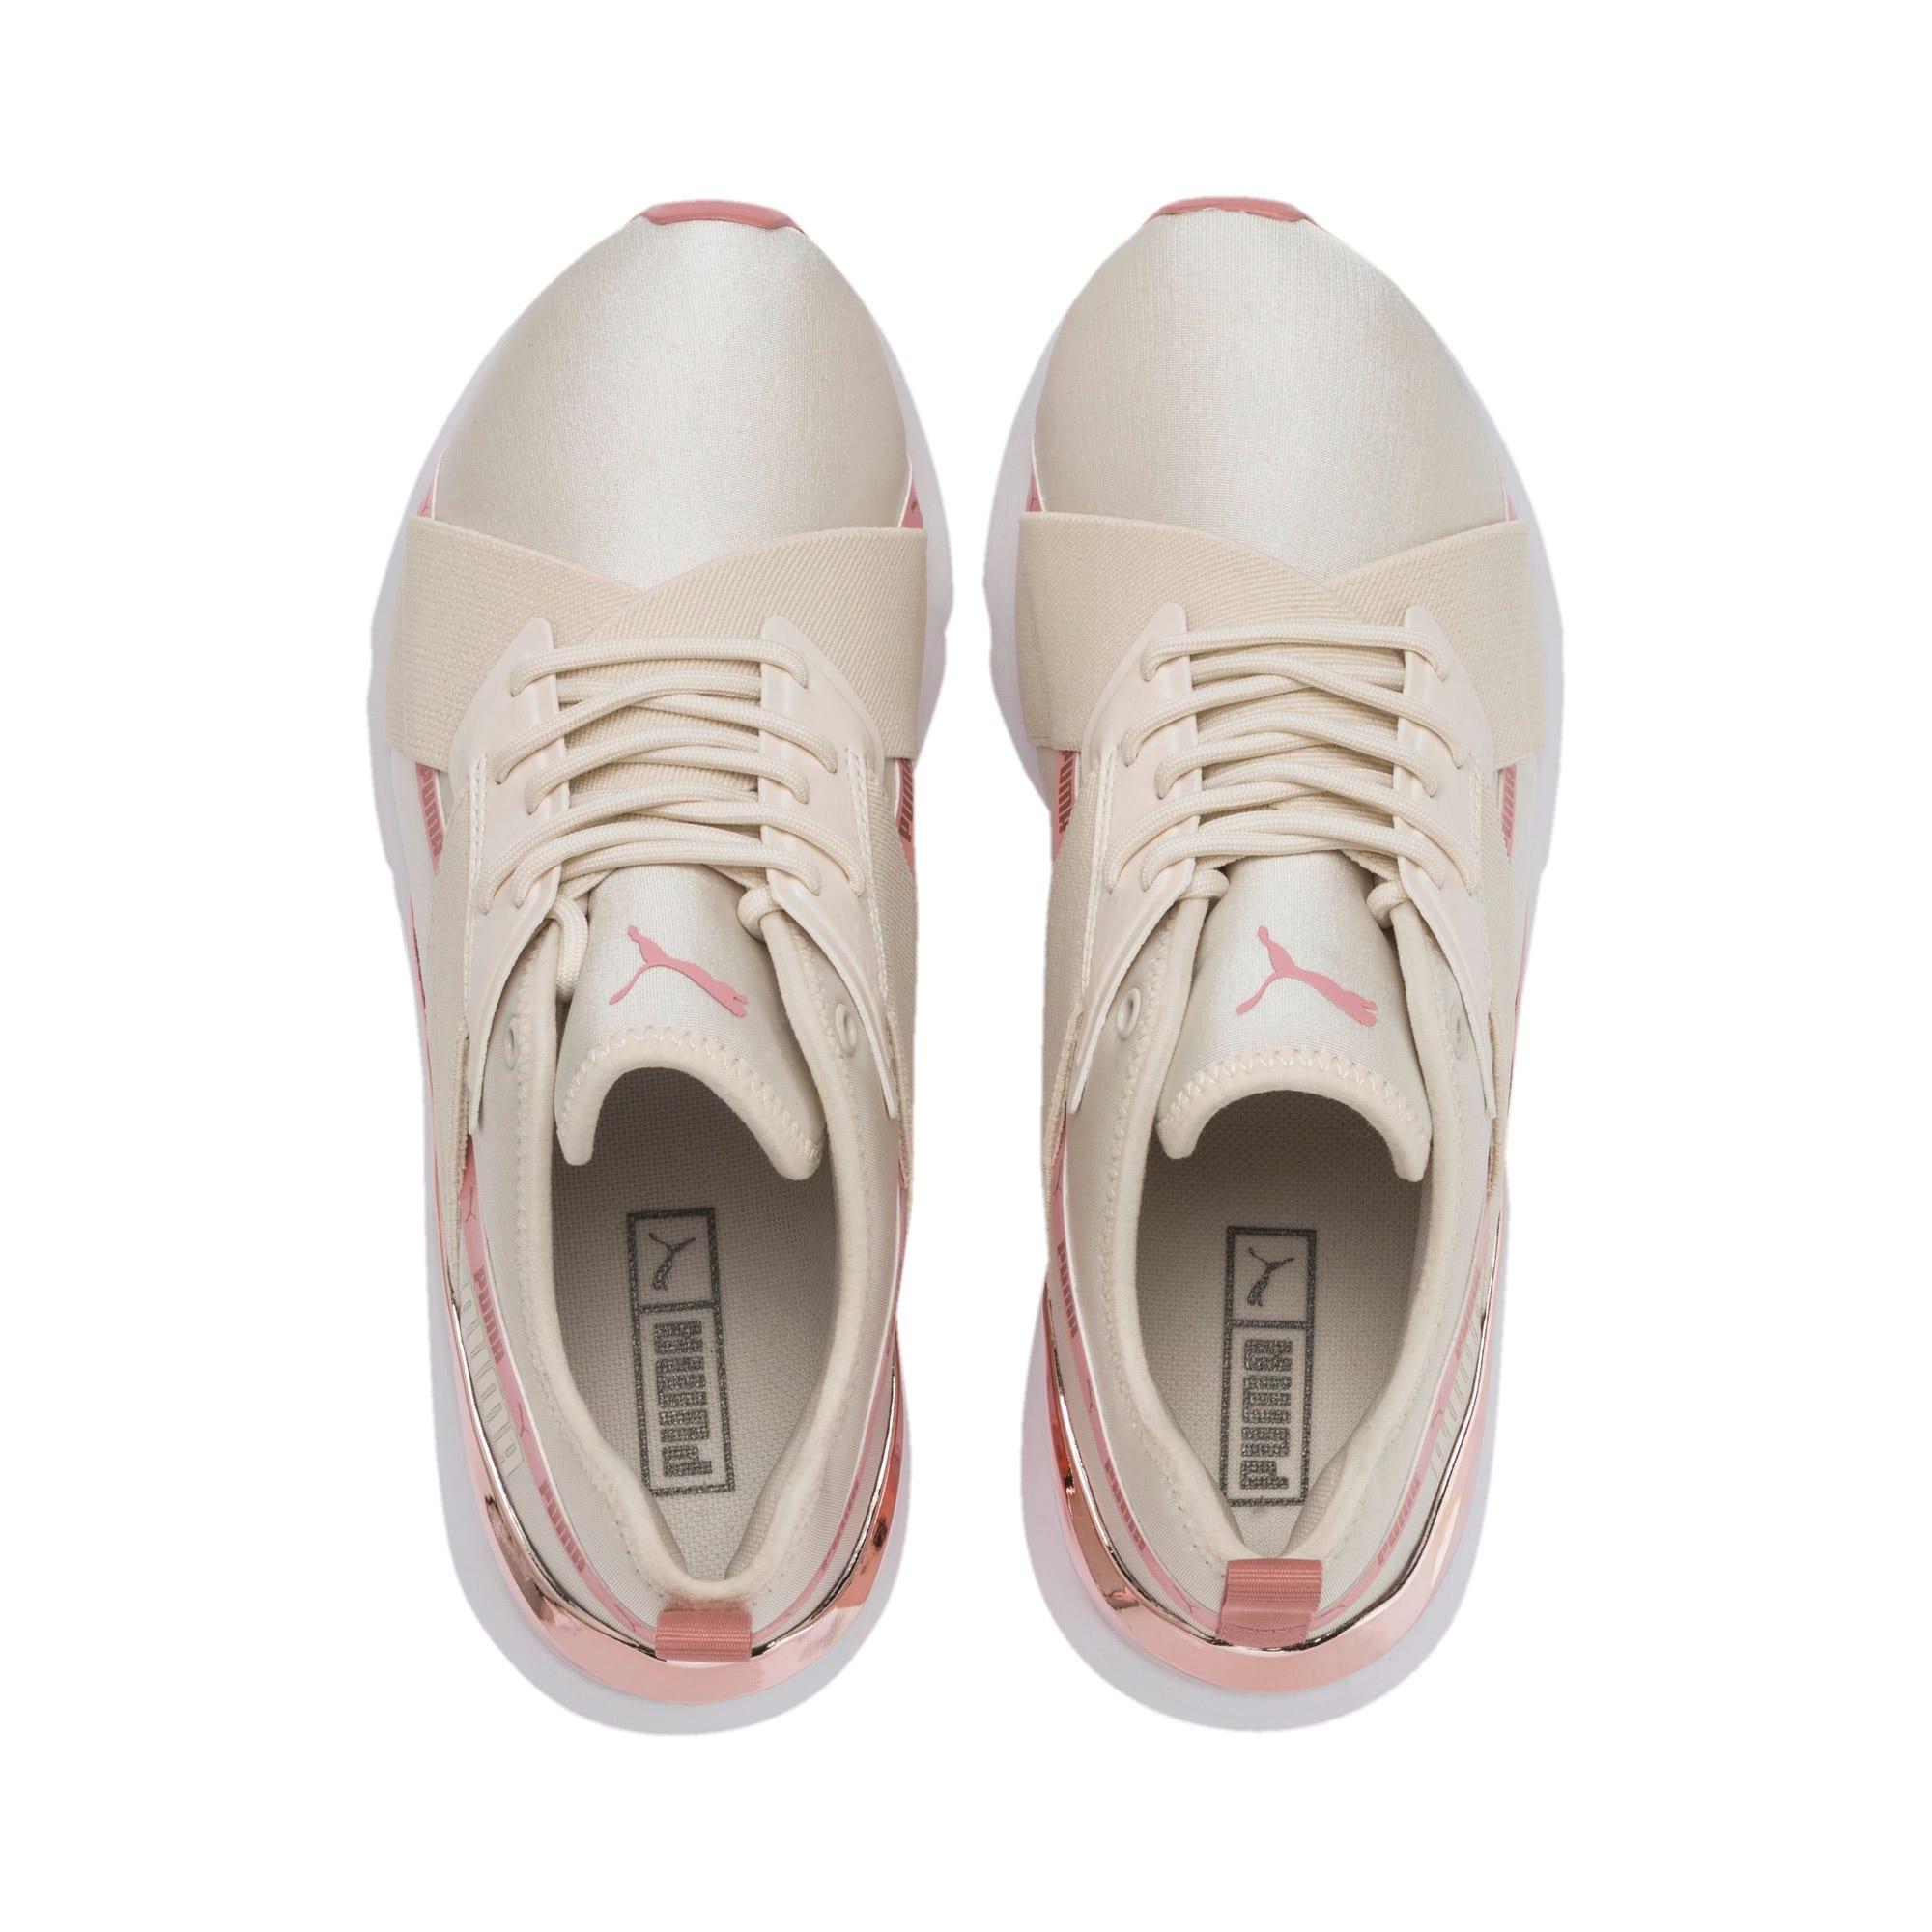 Thumbnail 7 of Muse X-2 Metallic Women's Sneakers, Pastel Parchment-Rose Gold, medium